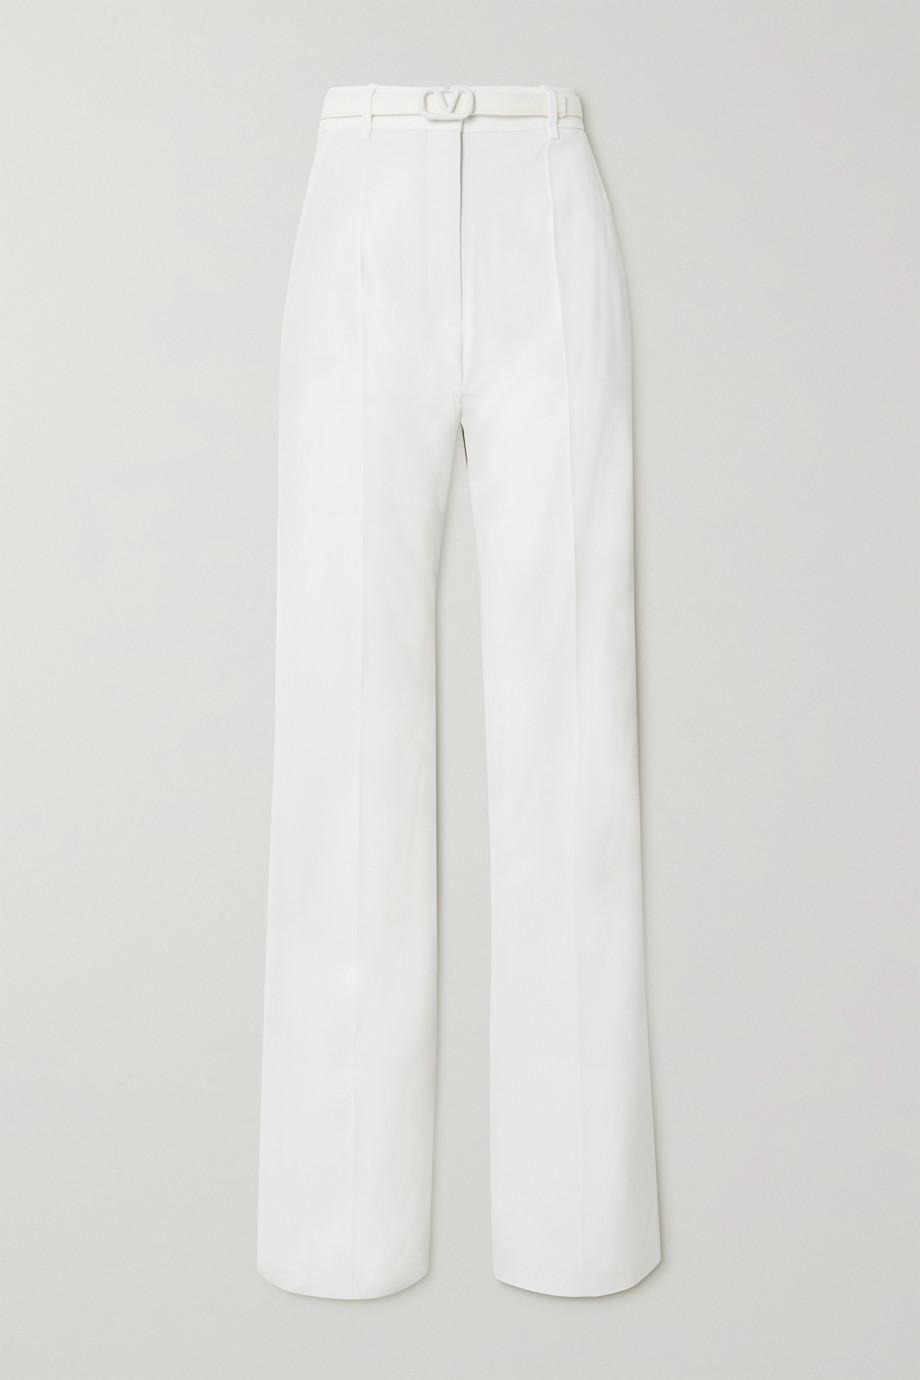 Valentino Pantalon droit en crêpe à ceinture VLOGO